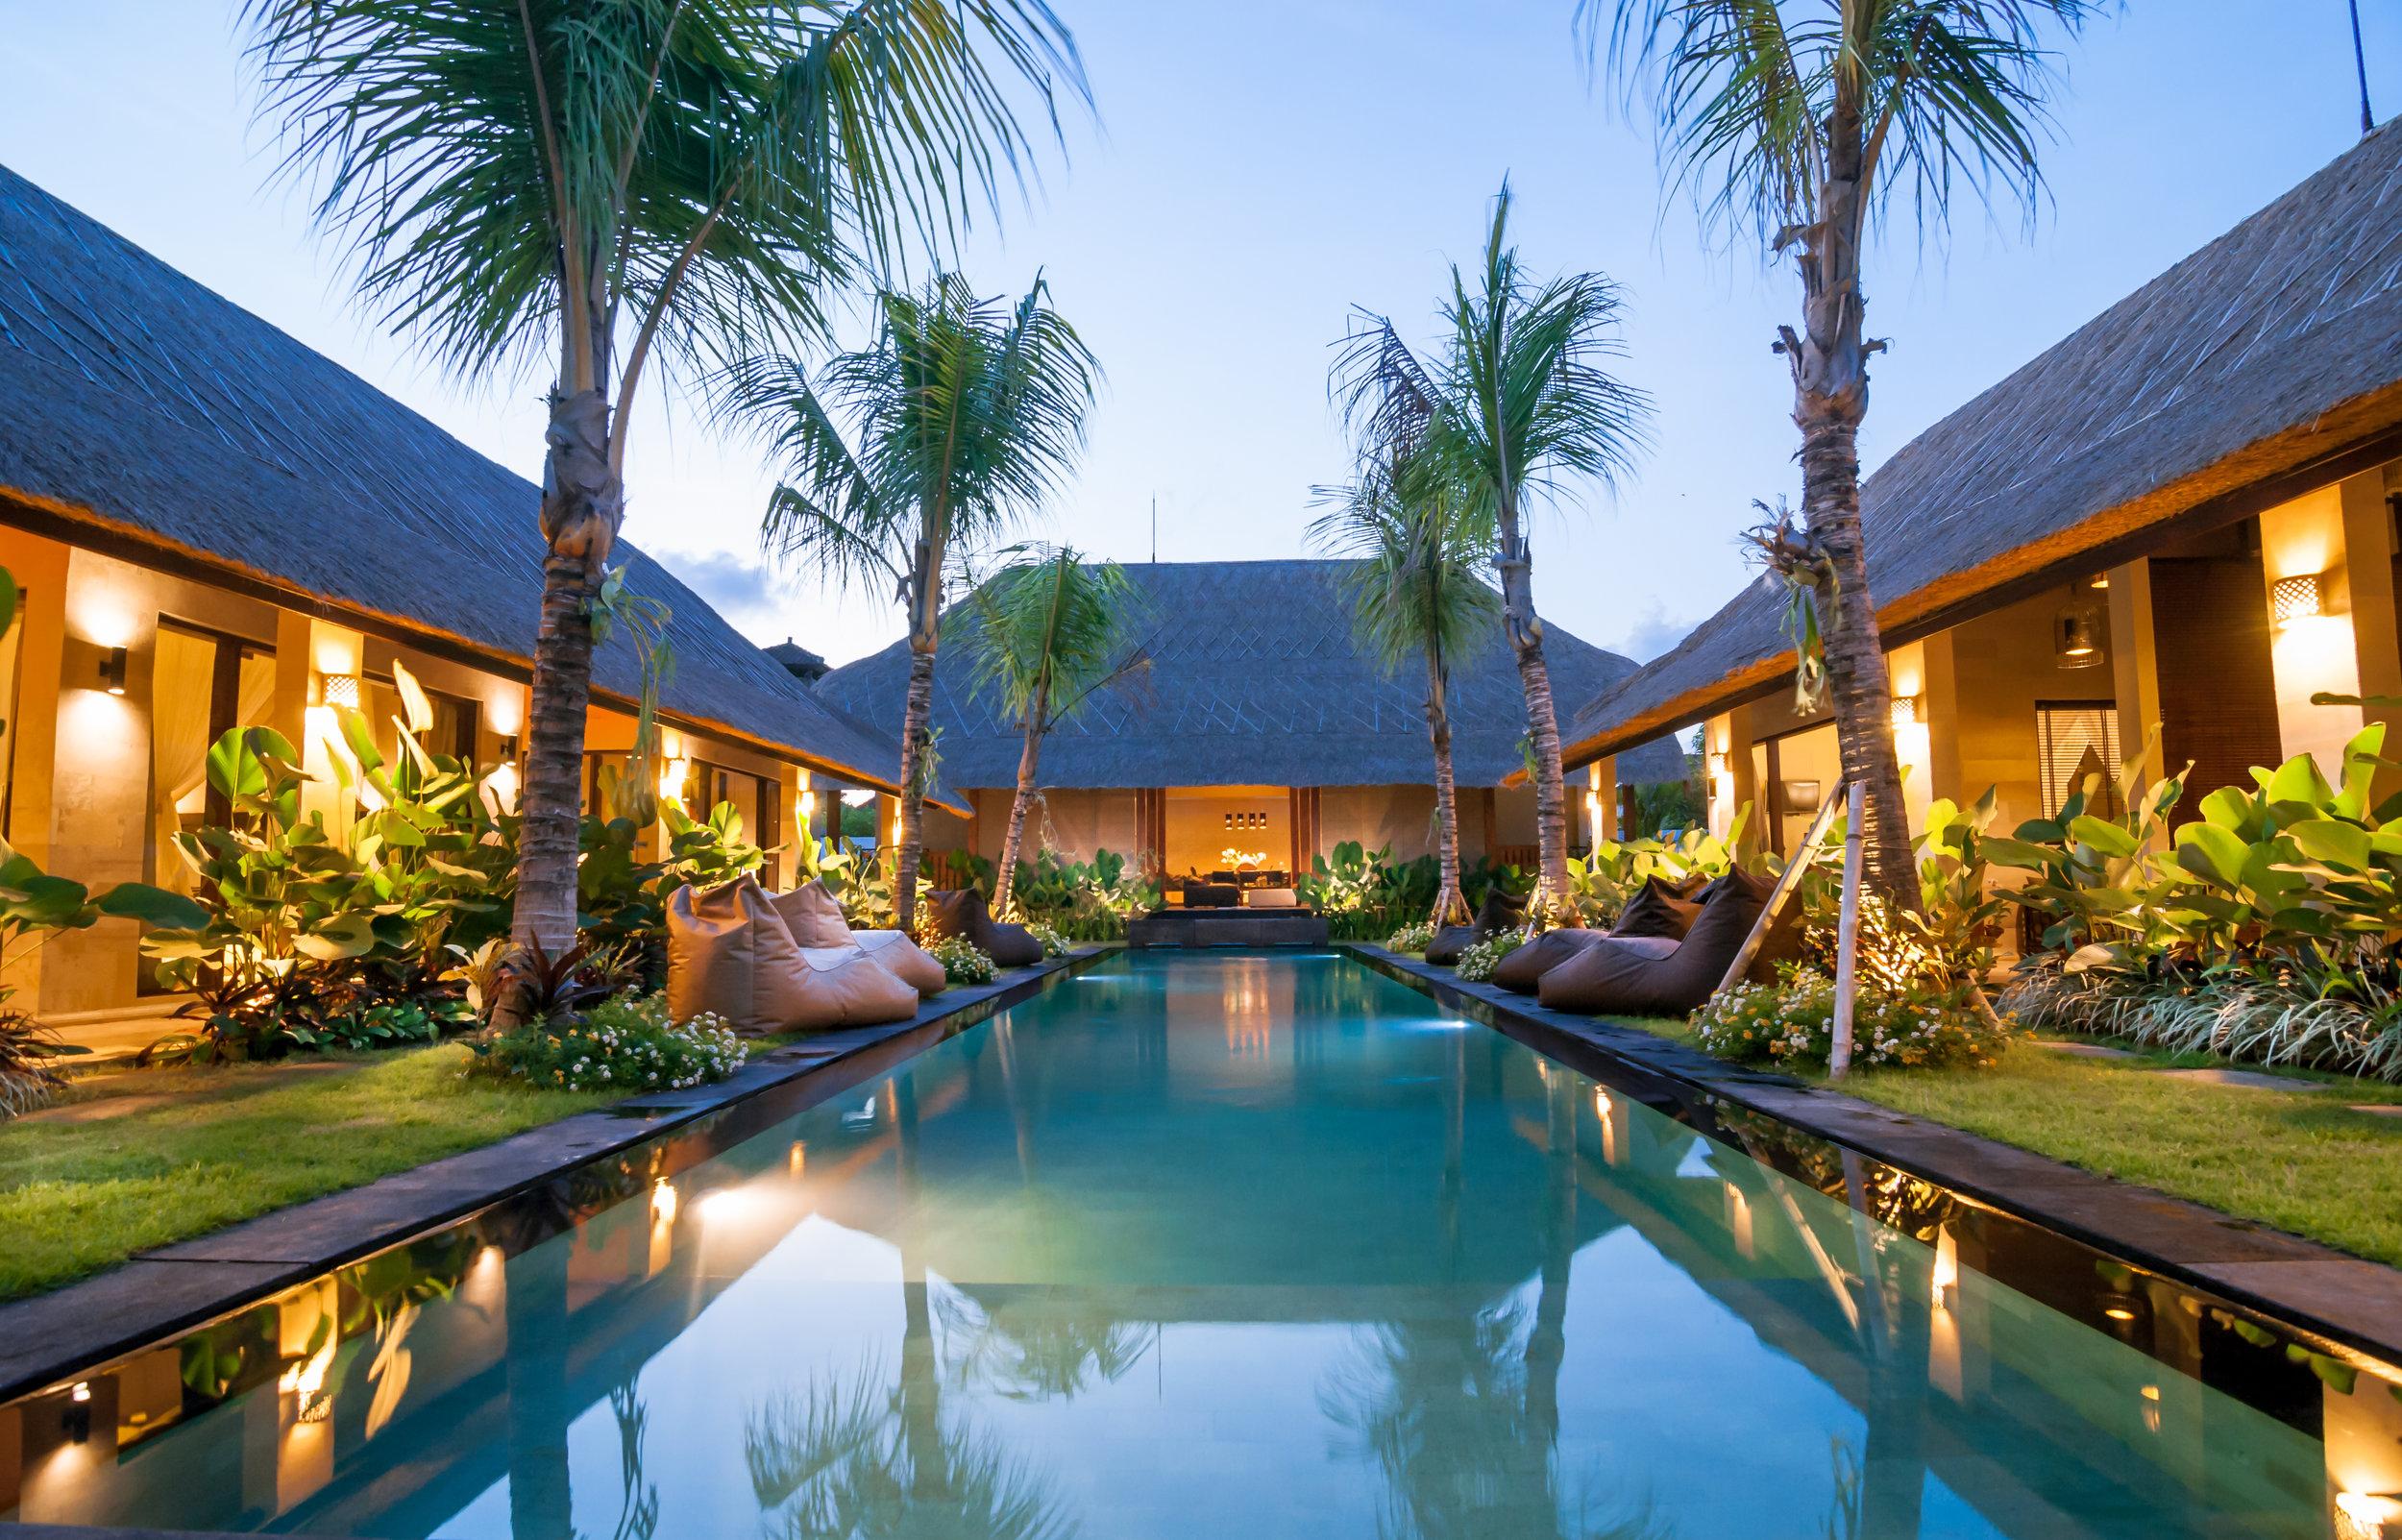 Karmagali Suites, Sanur, Bali -